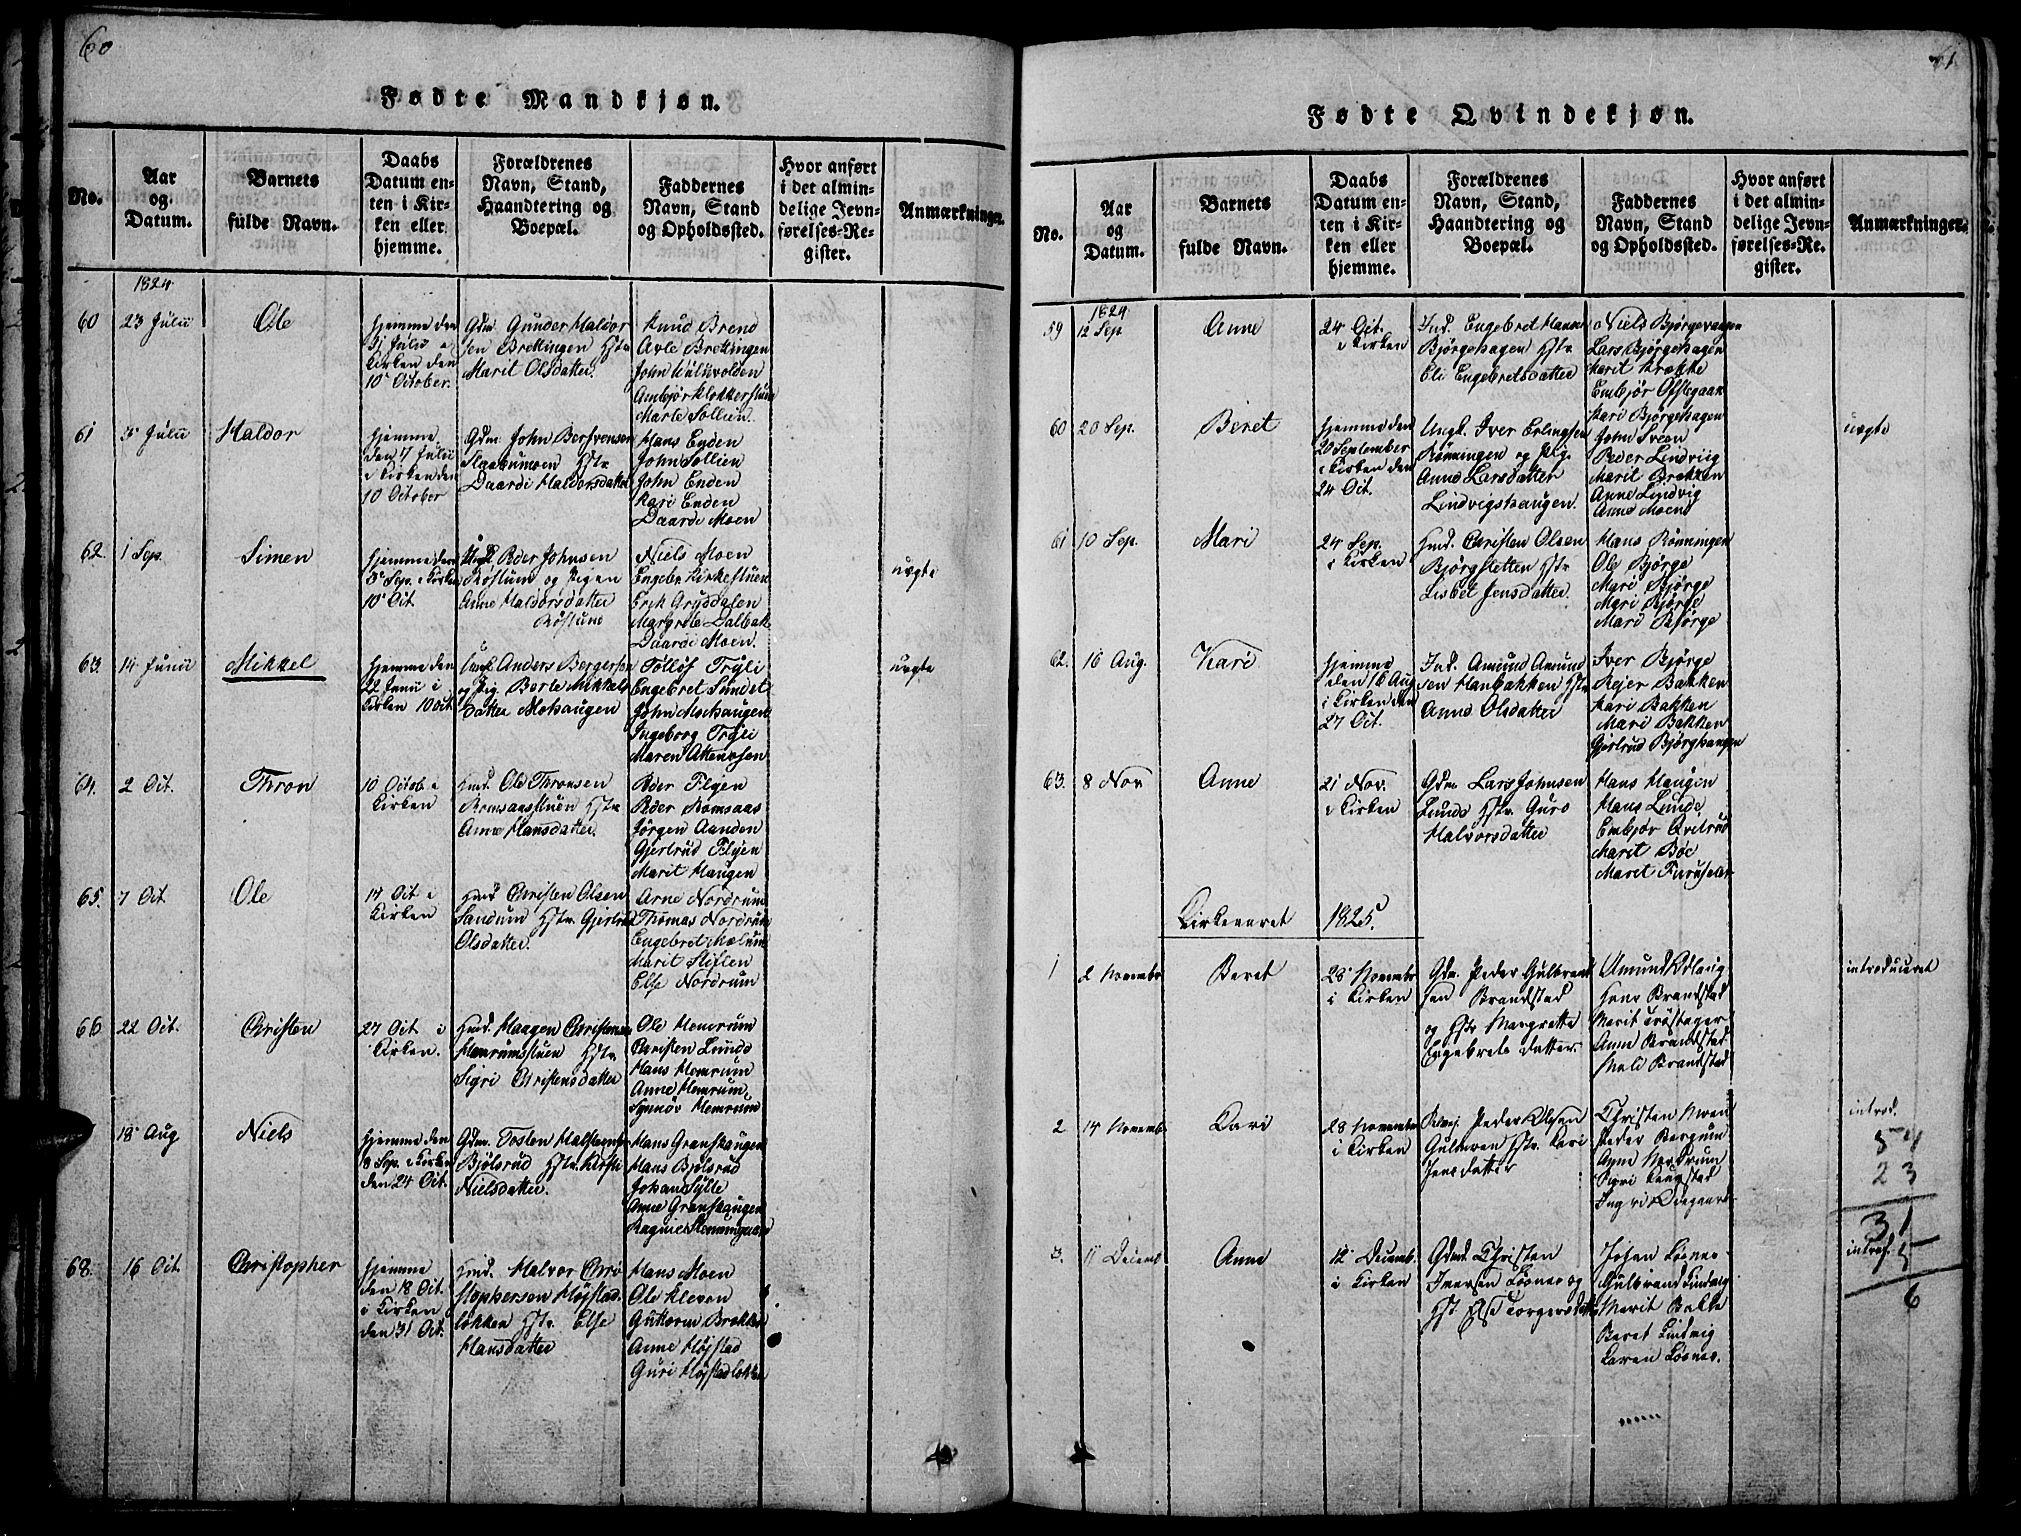 SAH, Ringebu prestekontor, Ministerialbok nr. 4, 1821-1839, s. 60-61